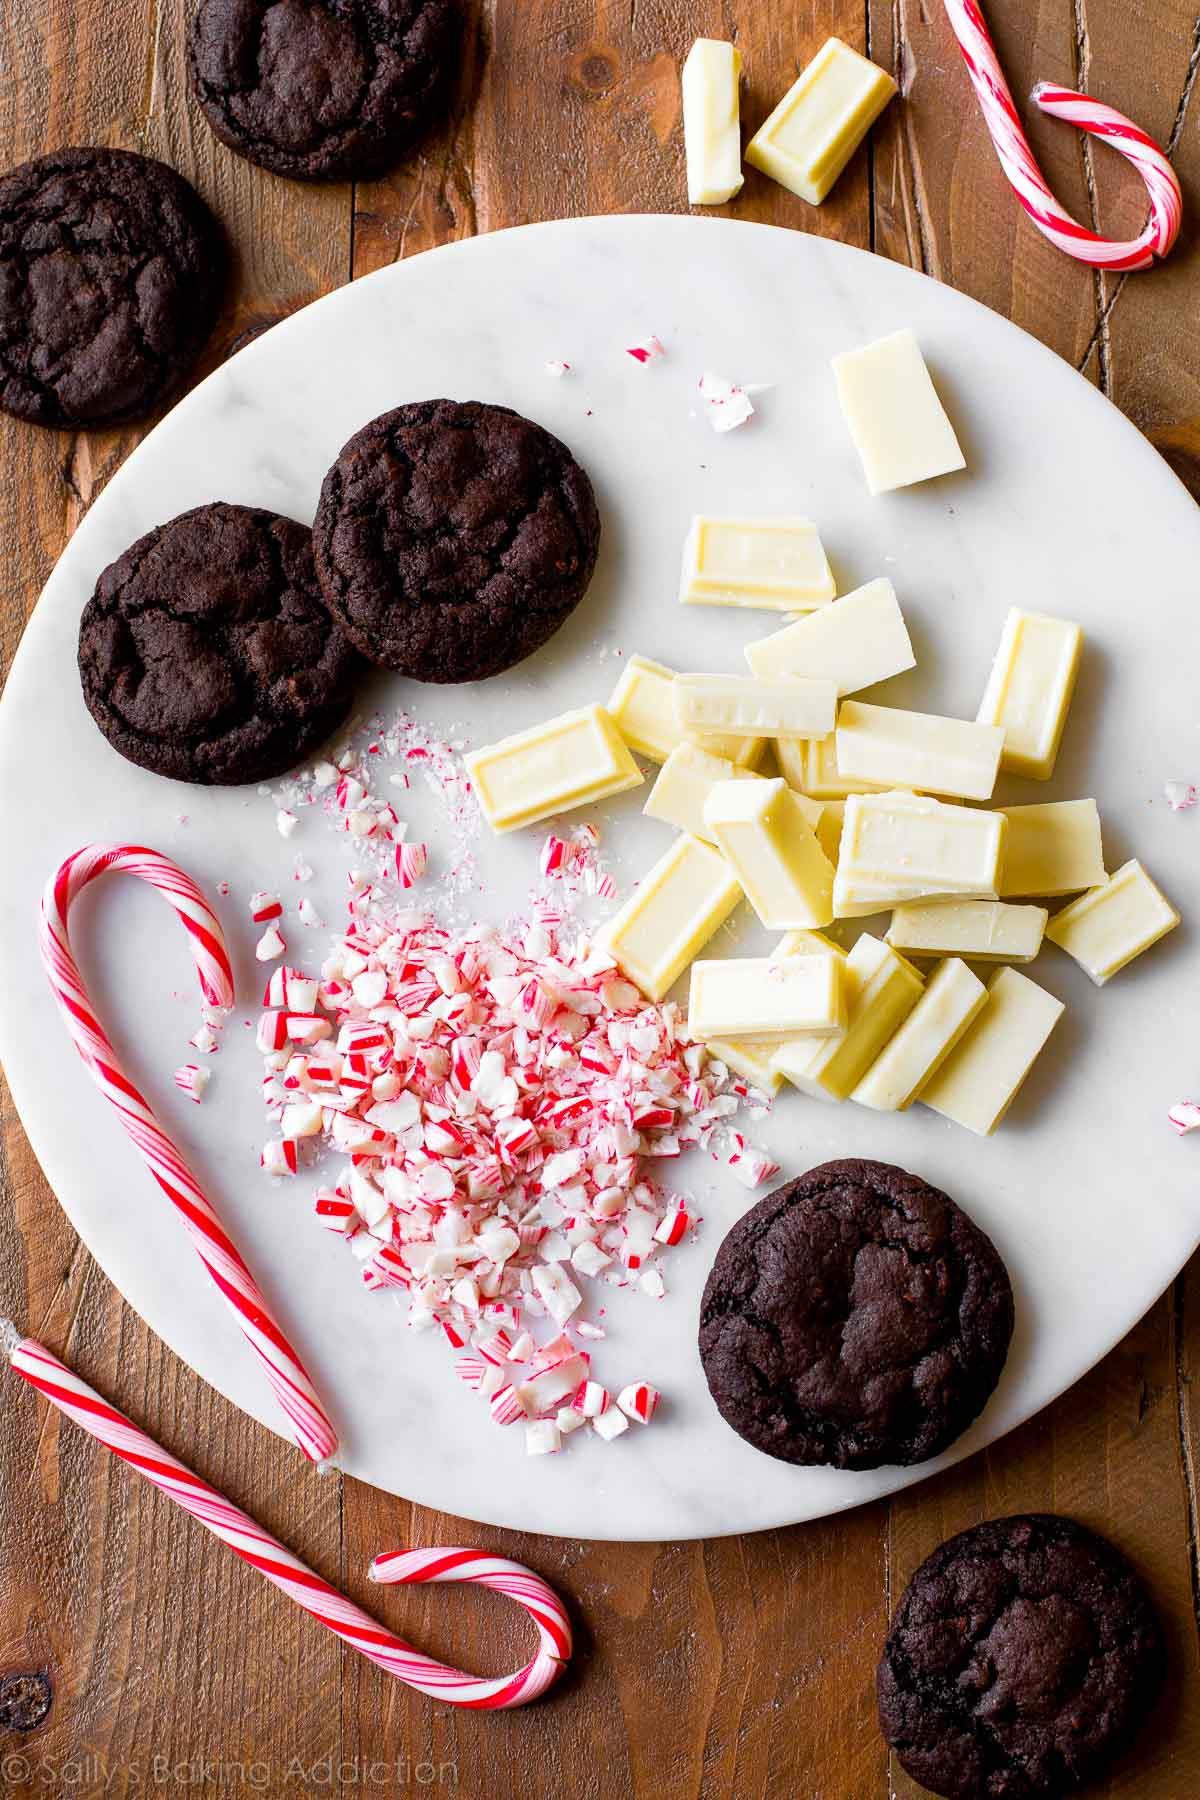 Peppermint Mocha Cookies Sallys Baking Addiction